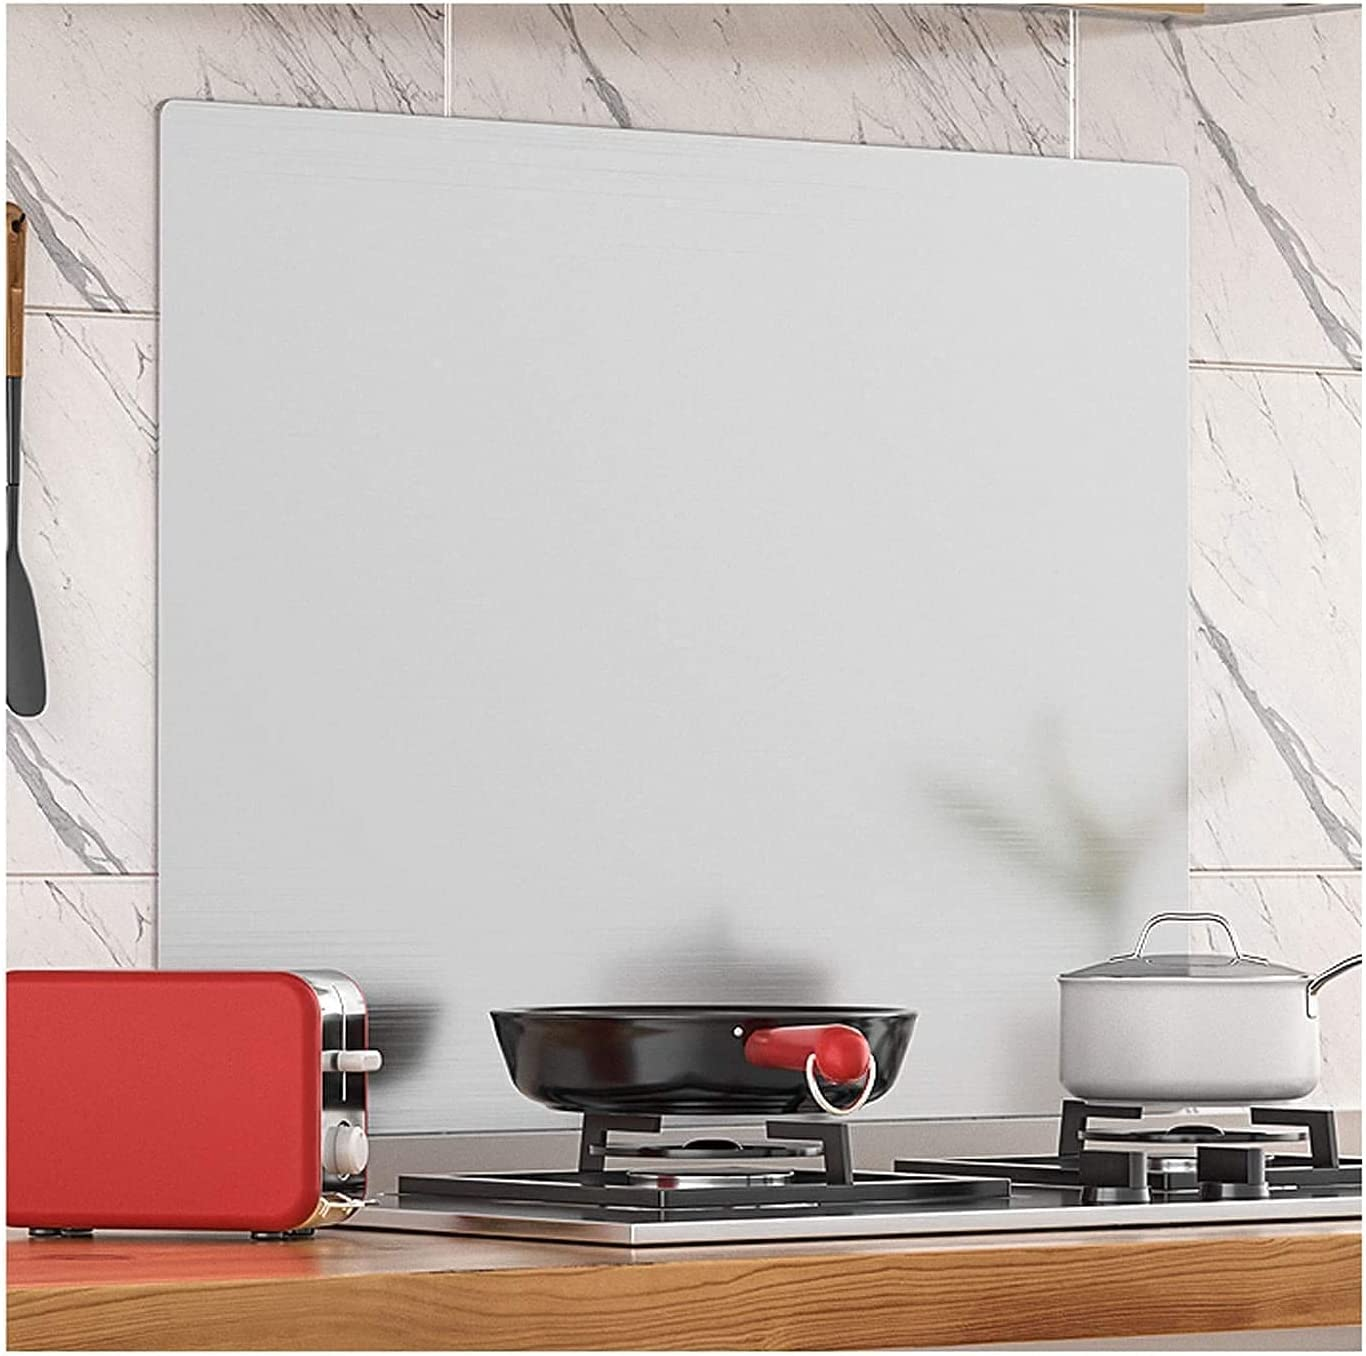 FANNISS Over item handling Splatter guardKitchen Foil Stove Screens Shield OFFicial